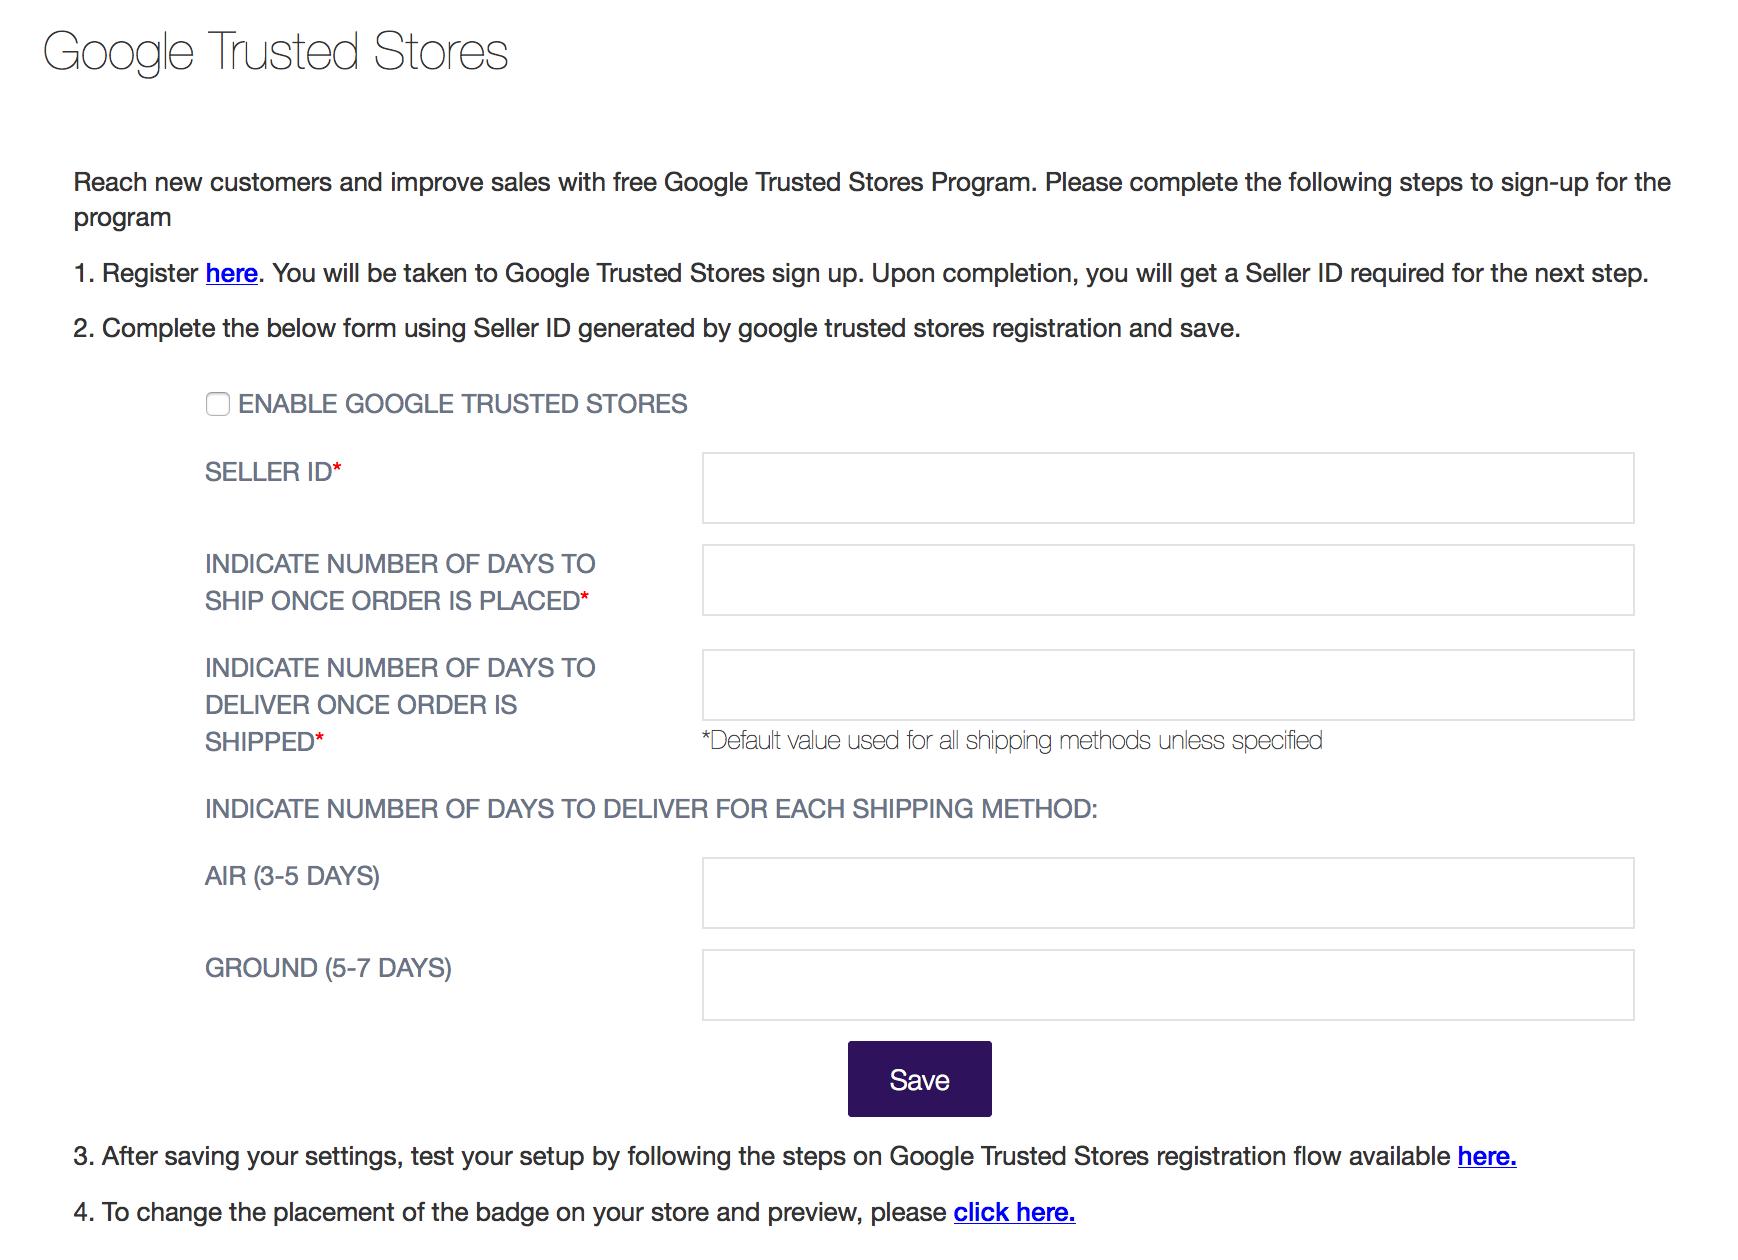 Google Trusted Stores Setup Option